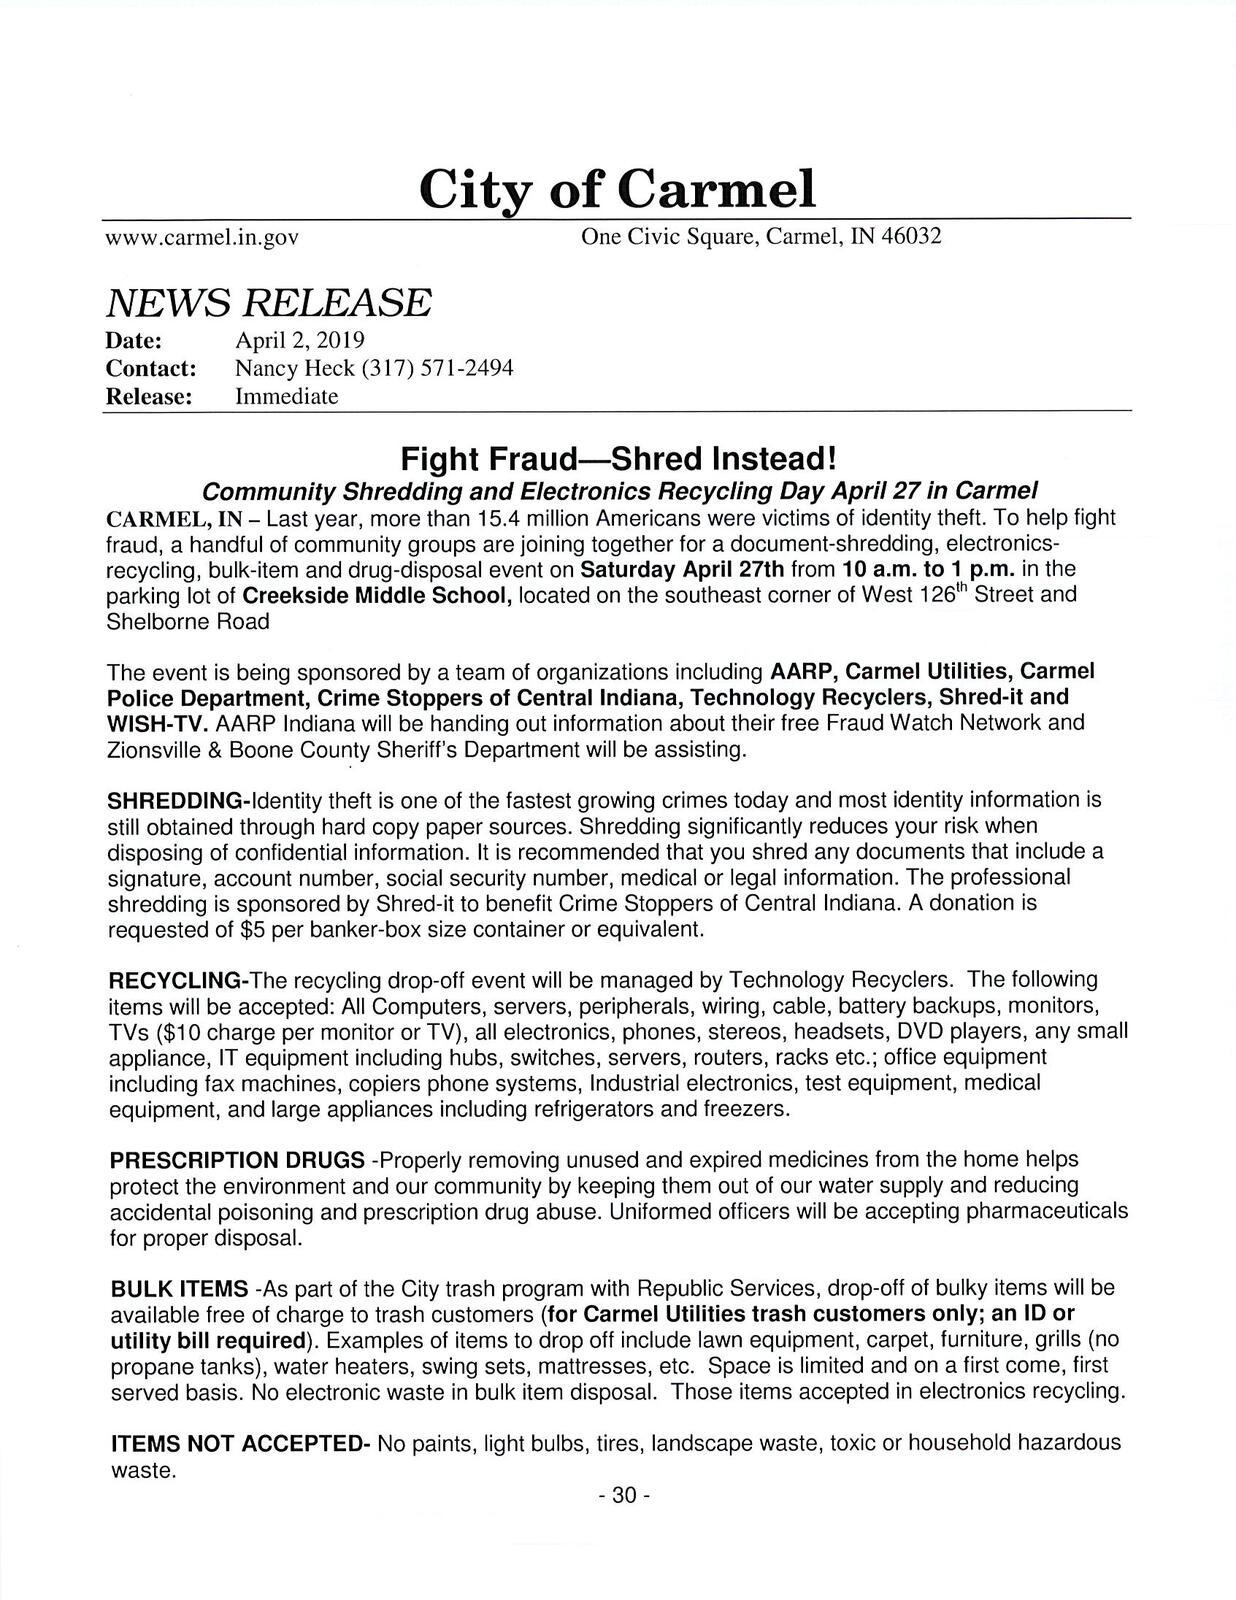 Shredding, Electronics Recycling, Bulk item Drop off (City of Carmel